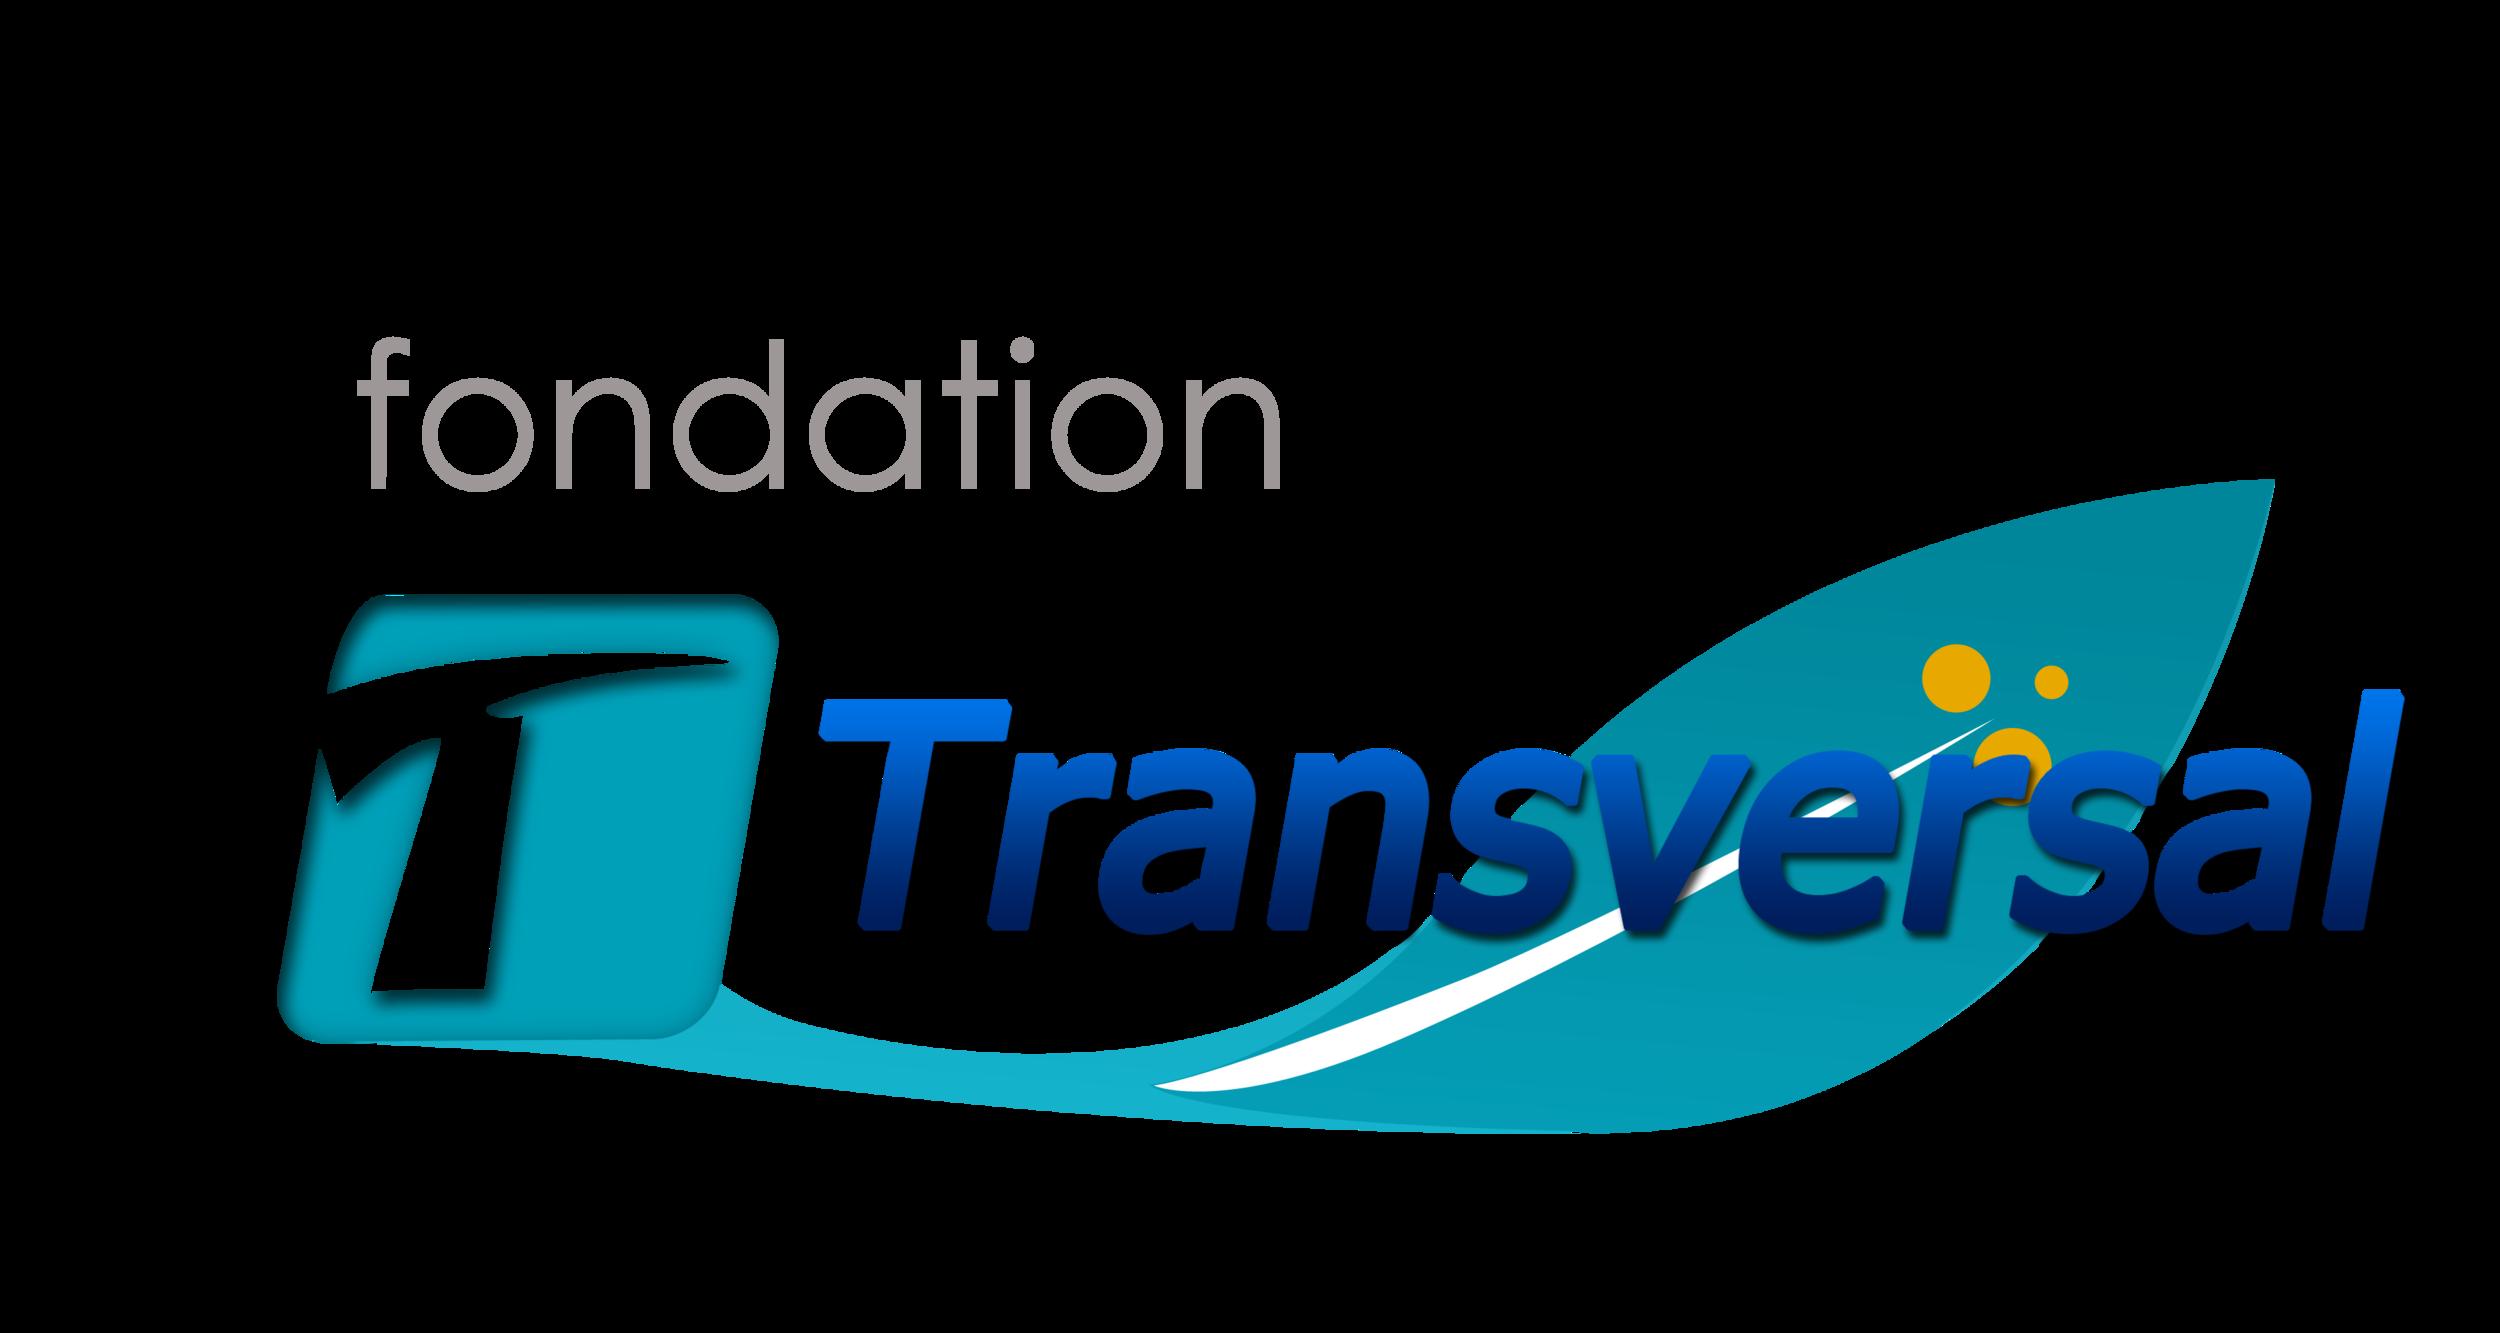 fondation transversa4.png